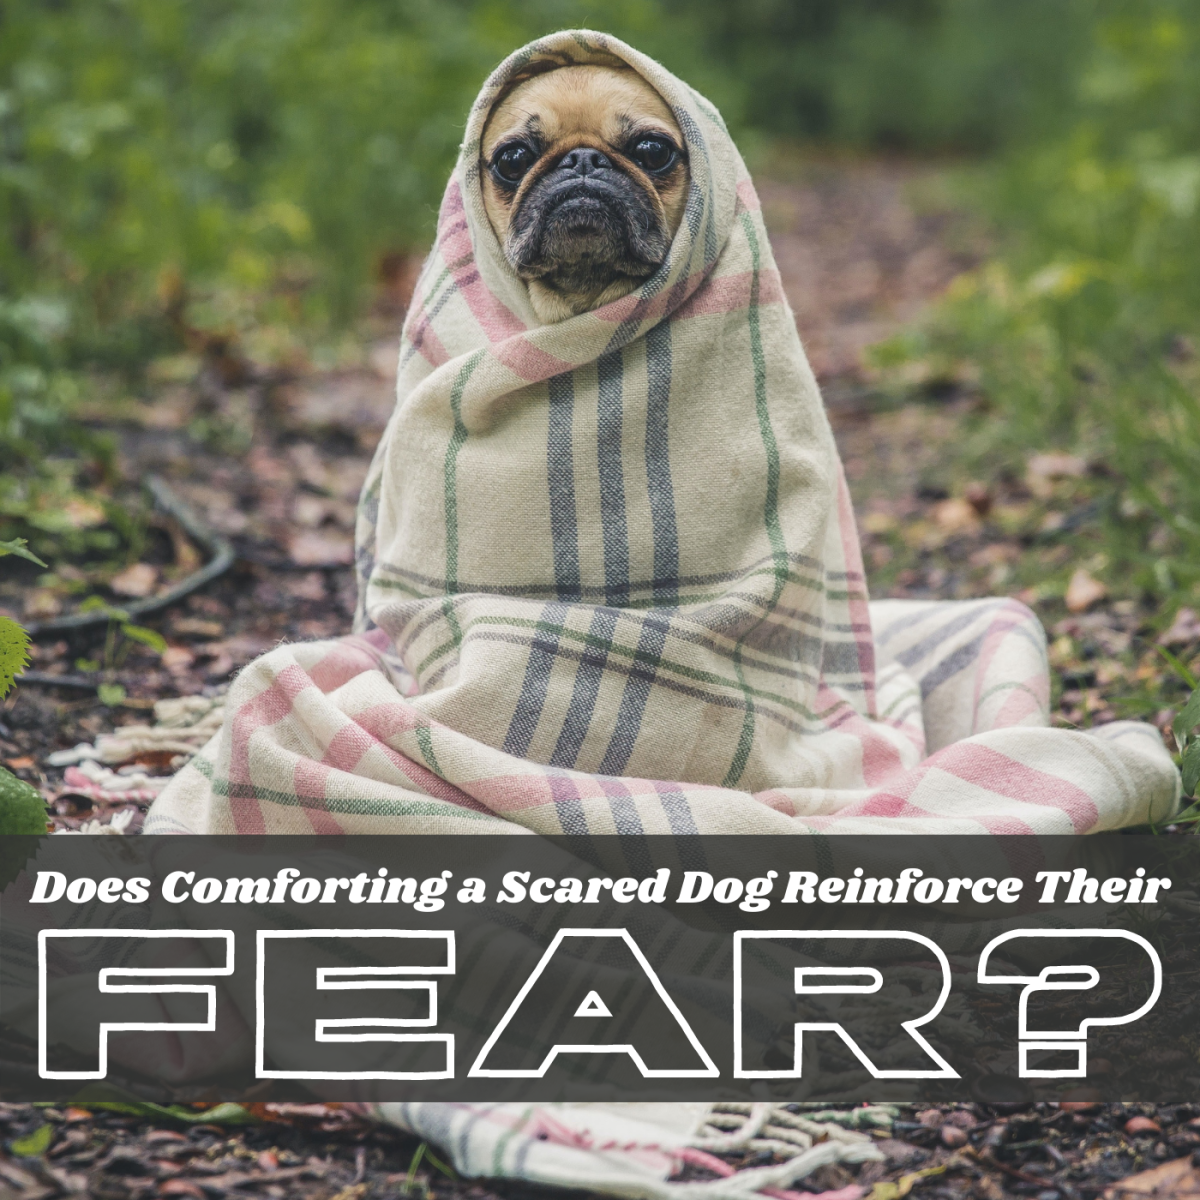 Can emotions like fear be reinforced like behaviors?